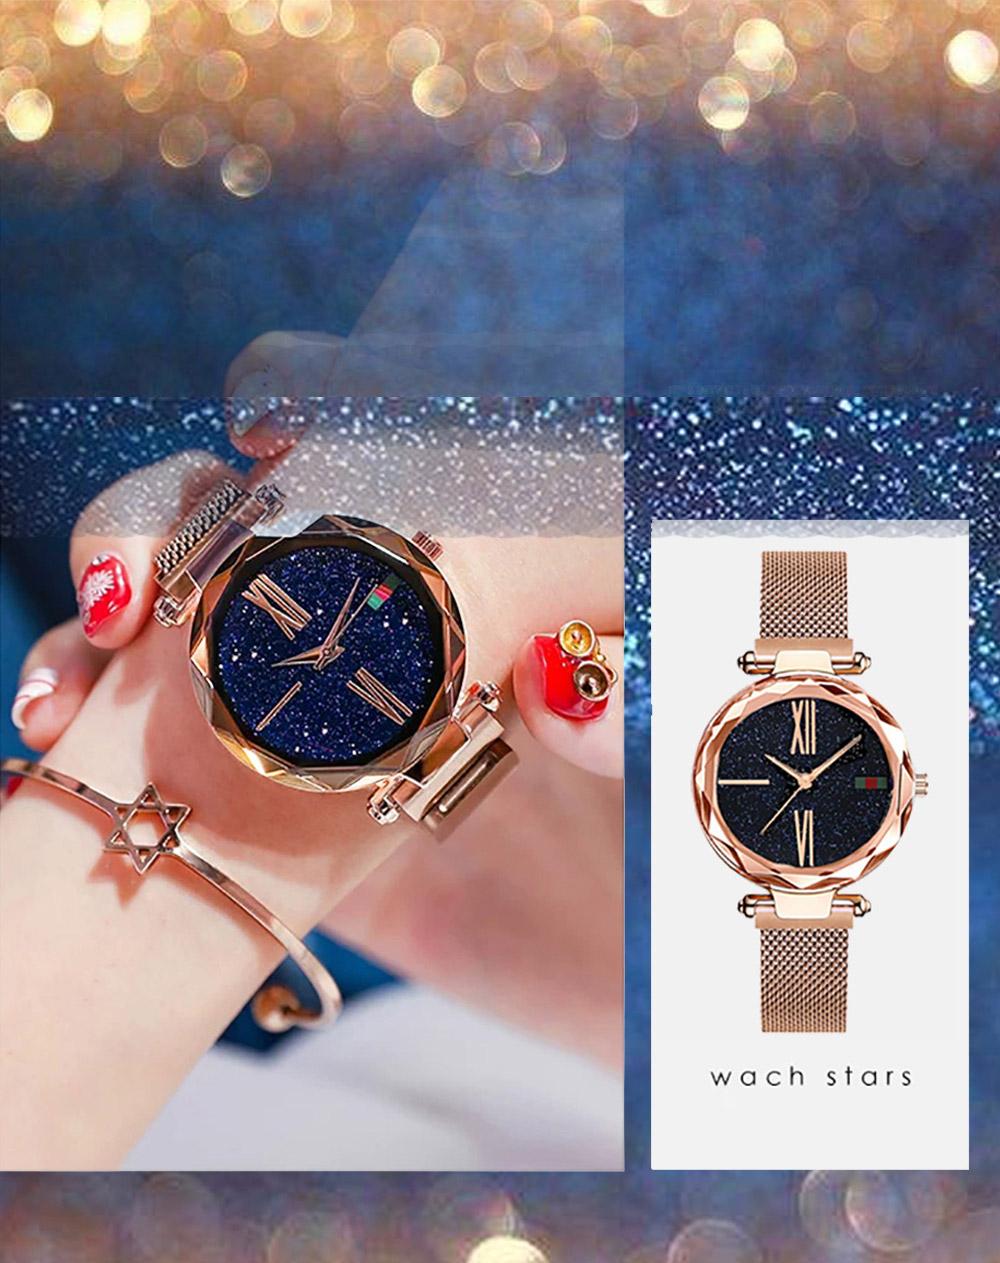 Relojes de lujo chapa oro rosa para mujer 5